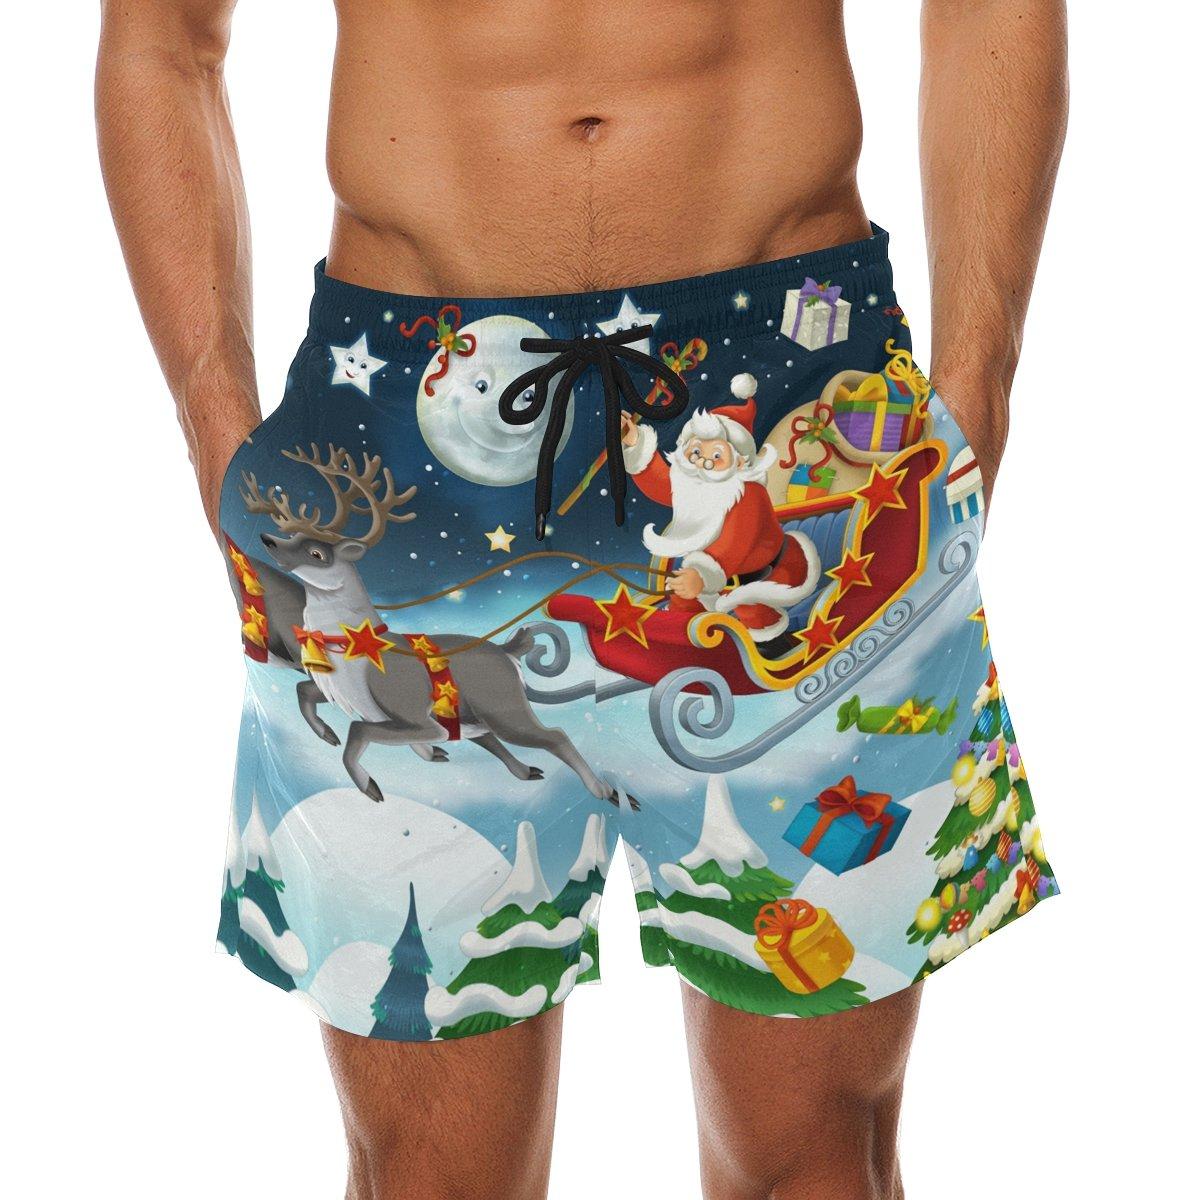 COOSUN Men's Christmas Santa Claus Beach Board Shorts Quick Dry Swim Trunk